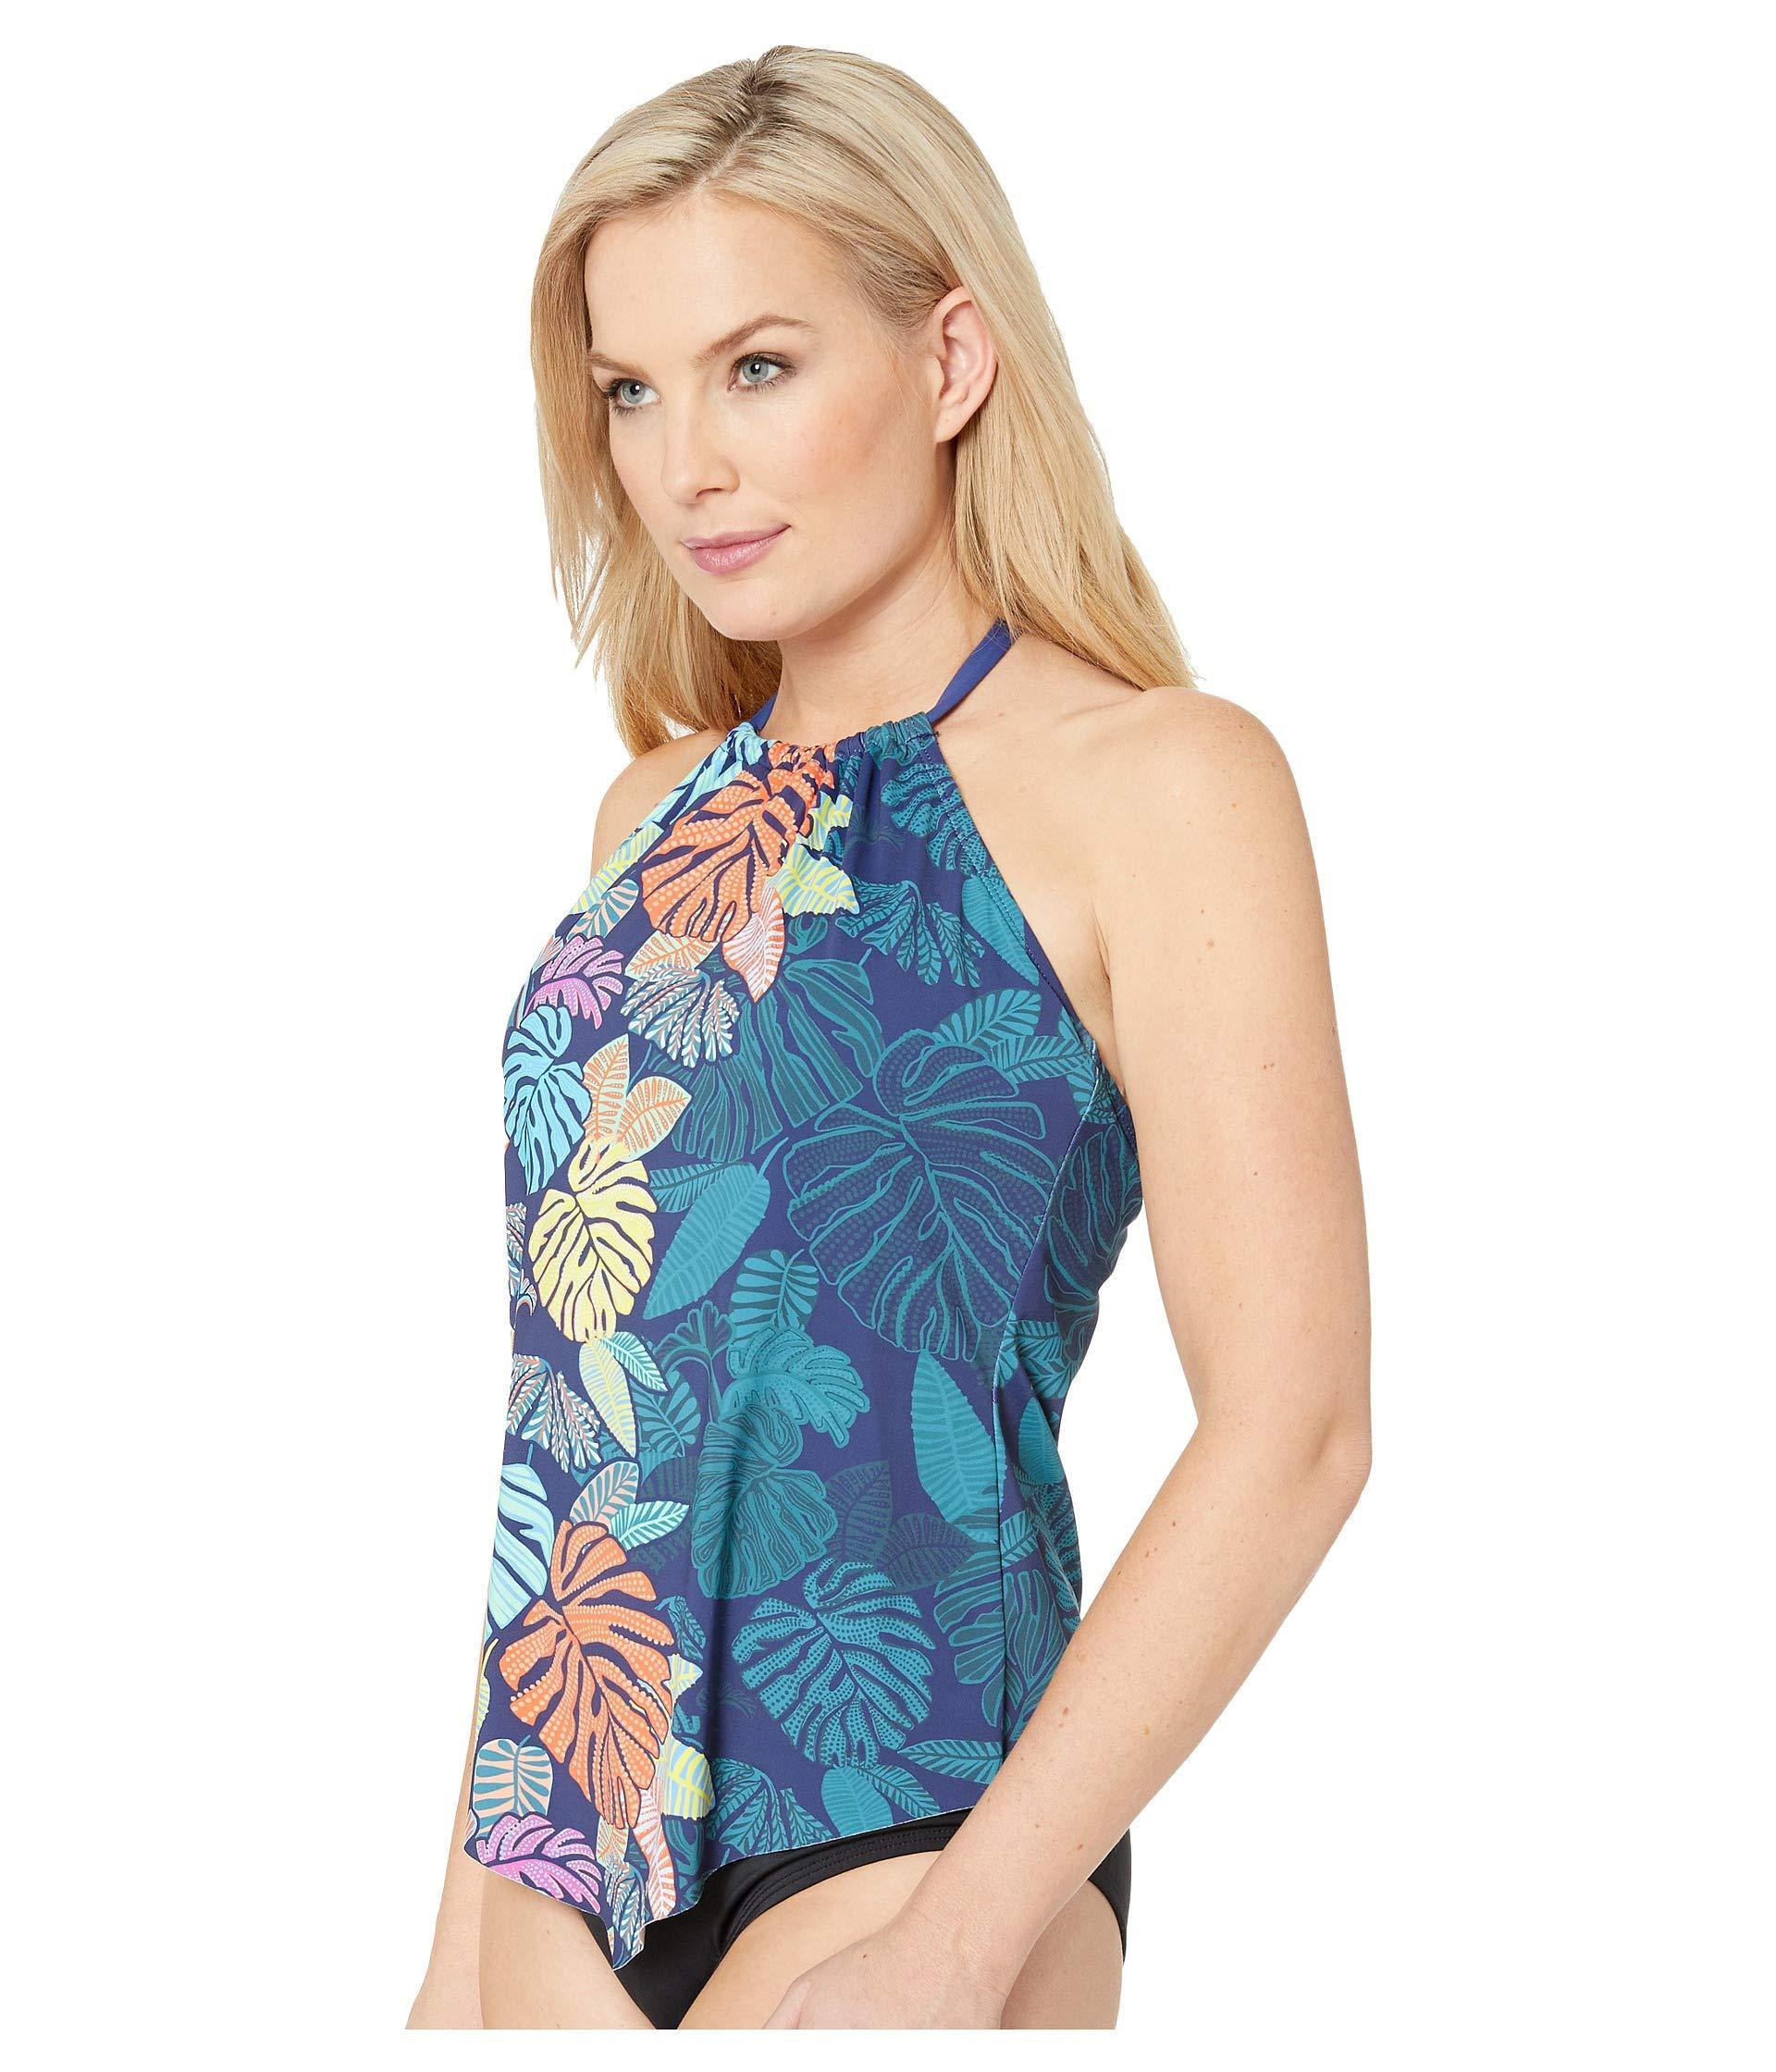 6a1fb2fae1 Lyst - 24th & Ocean Calm Palm High Neck Halter Tankini Top (navy) Women's  Swimwear in Blue